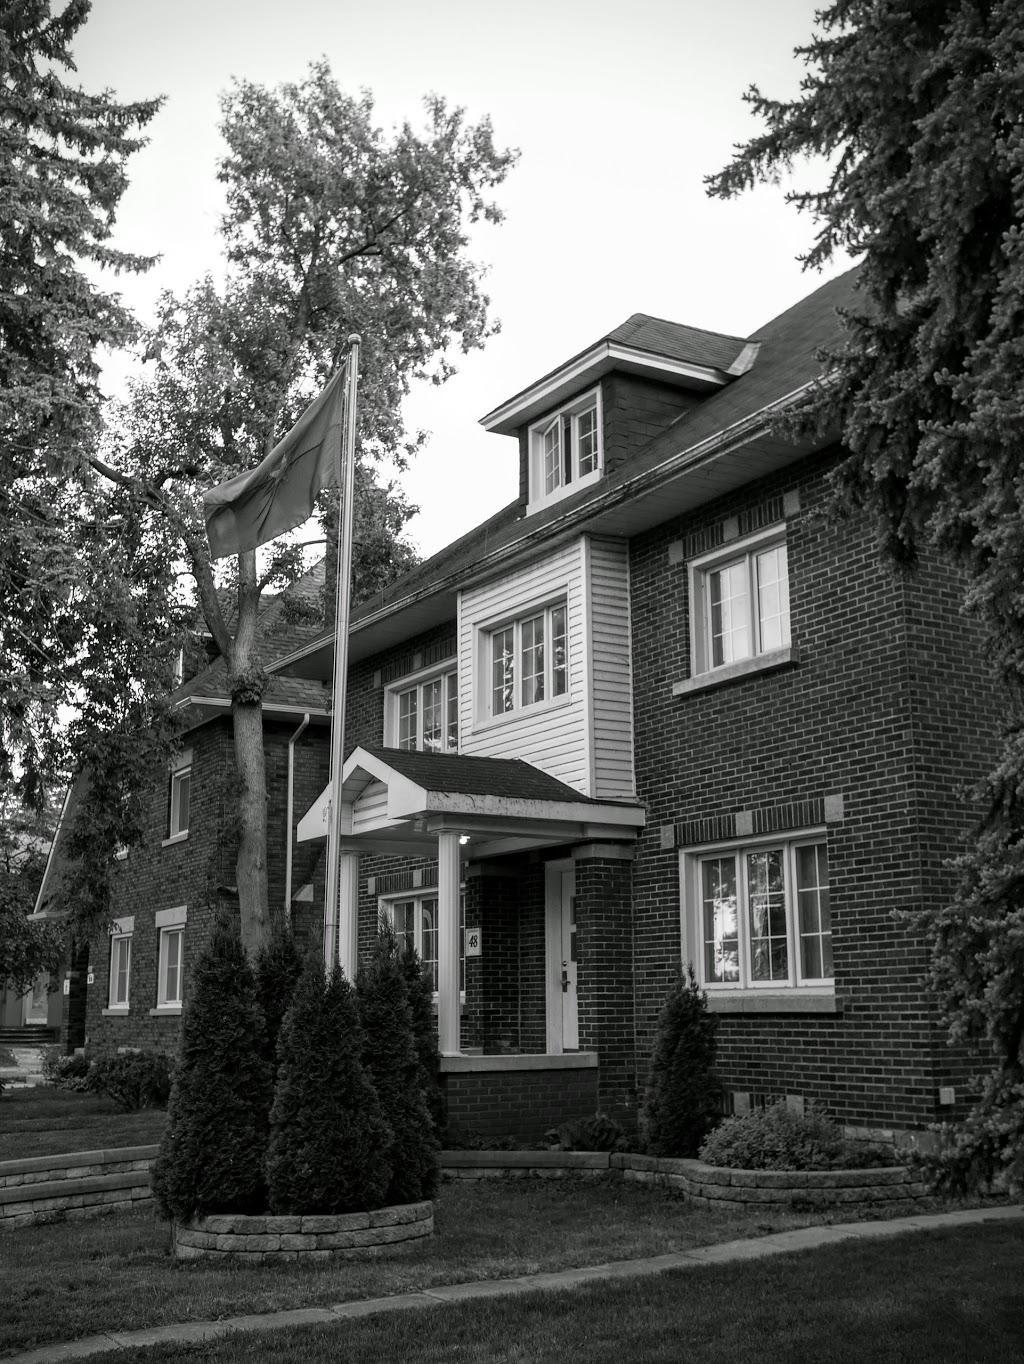 Embassy of Burkina Faso | embassy | 48 Range Rd, Ottawa, ON K1N 8J4, Canada | 6132384796 OR +1 613-238-4796